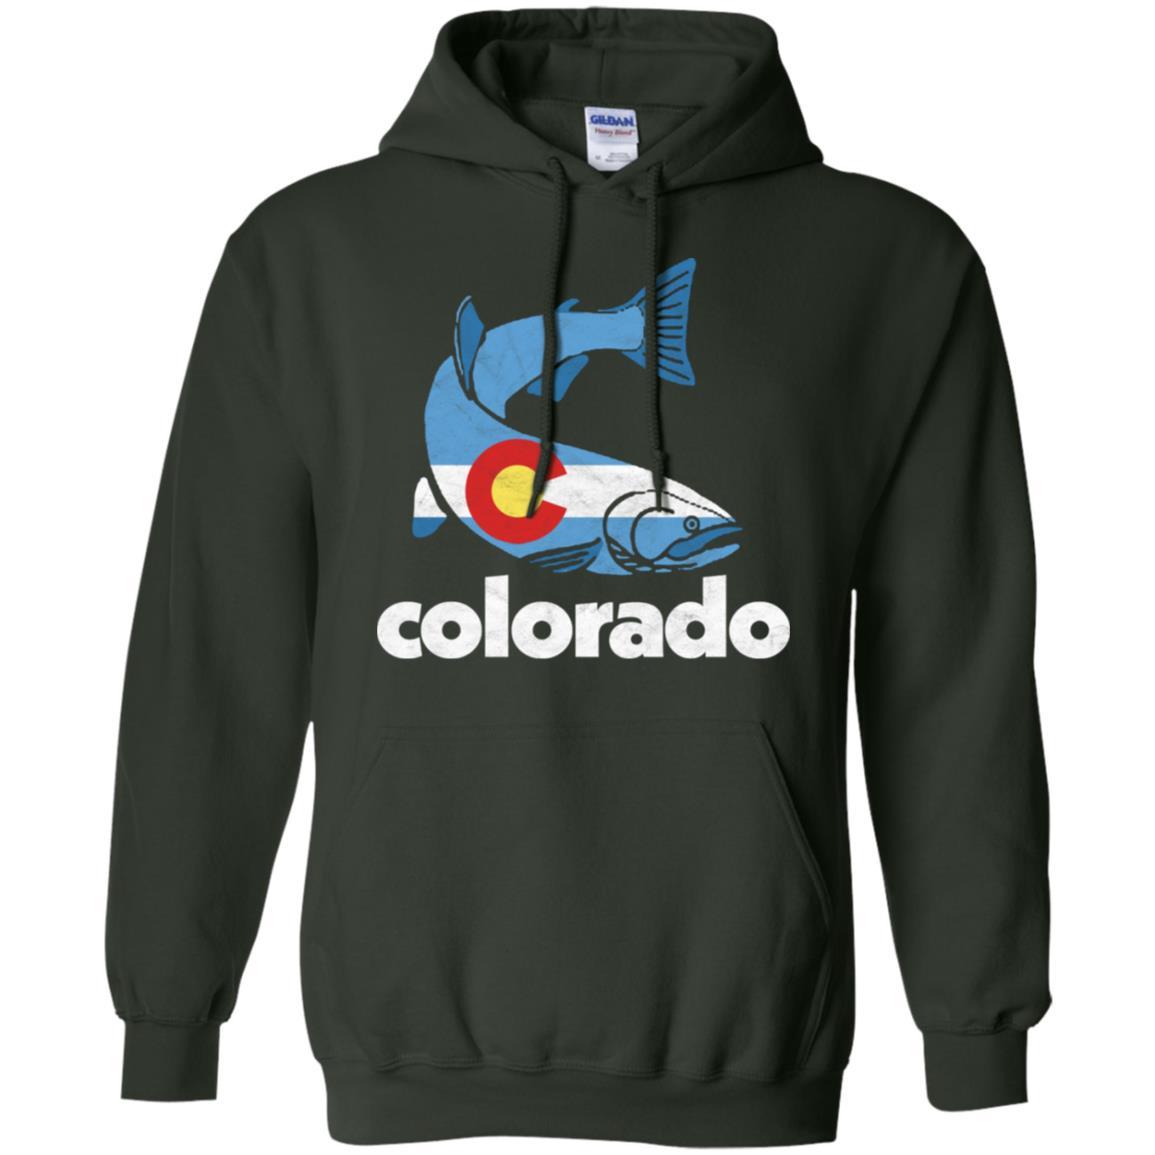 Retro Vintage Colorado Flag Fishing Pullover Hoodie